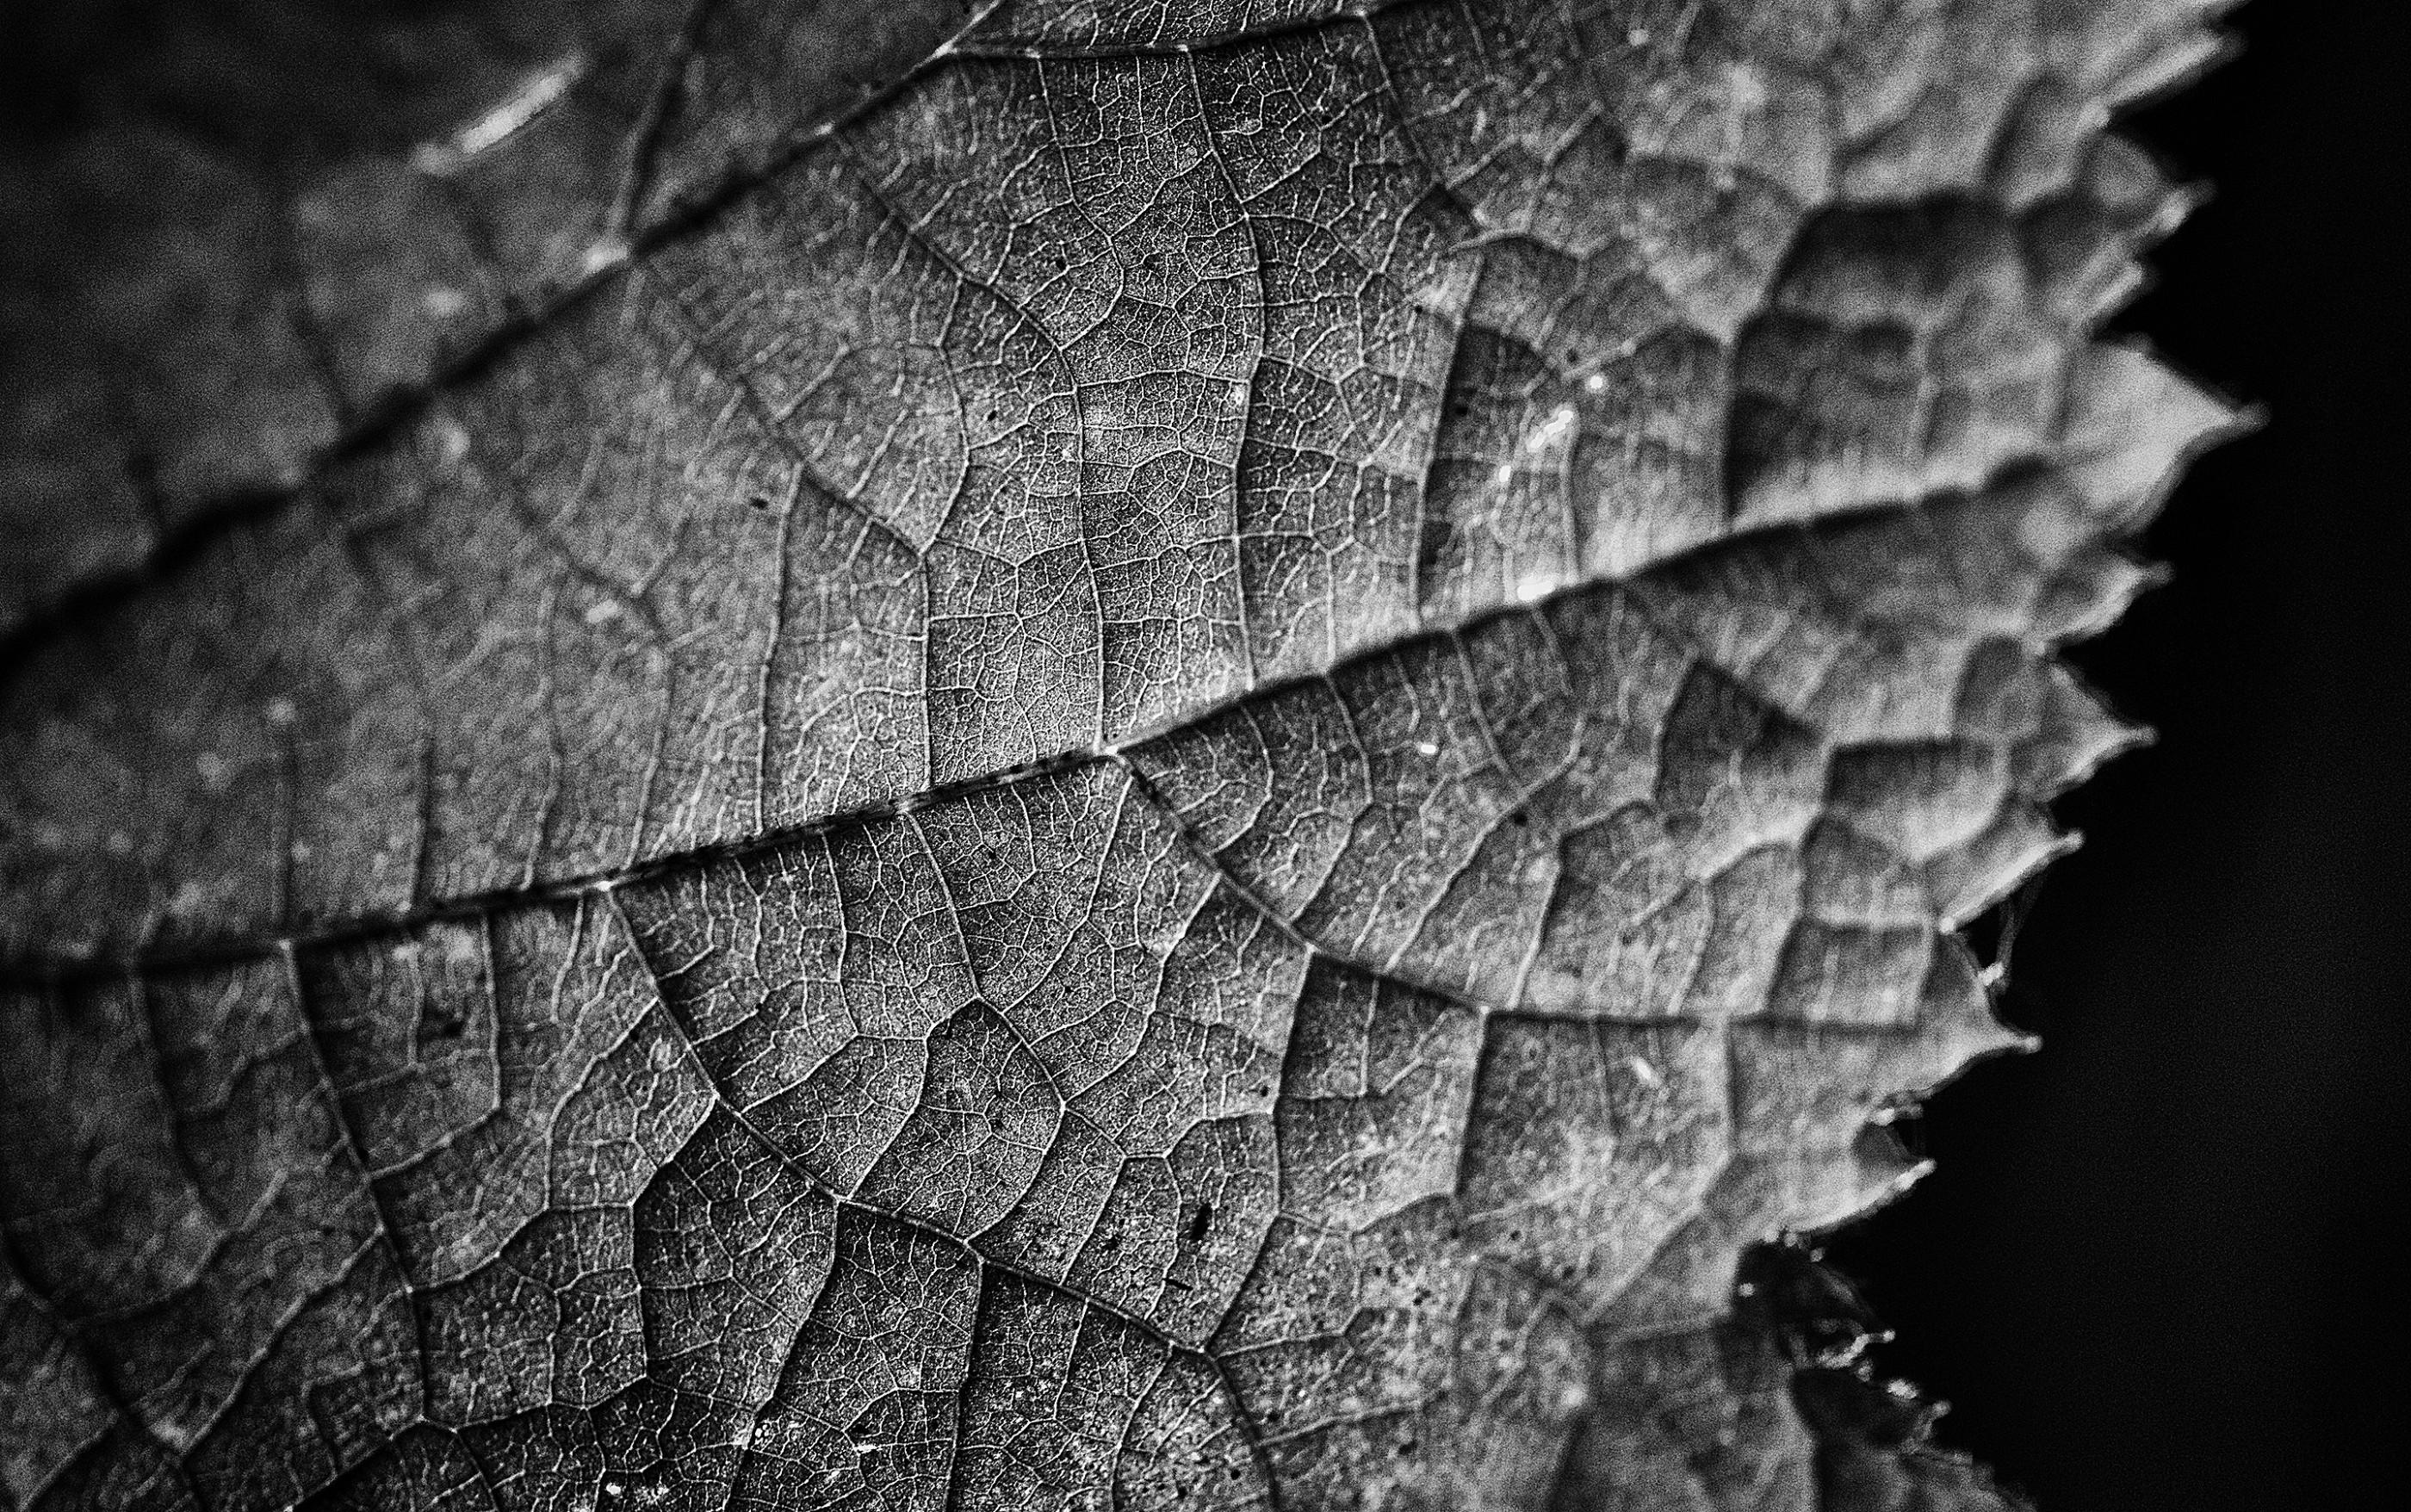 leaf-texture-bnw-fine-art-ash-newell